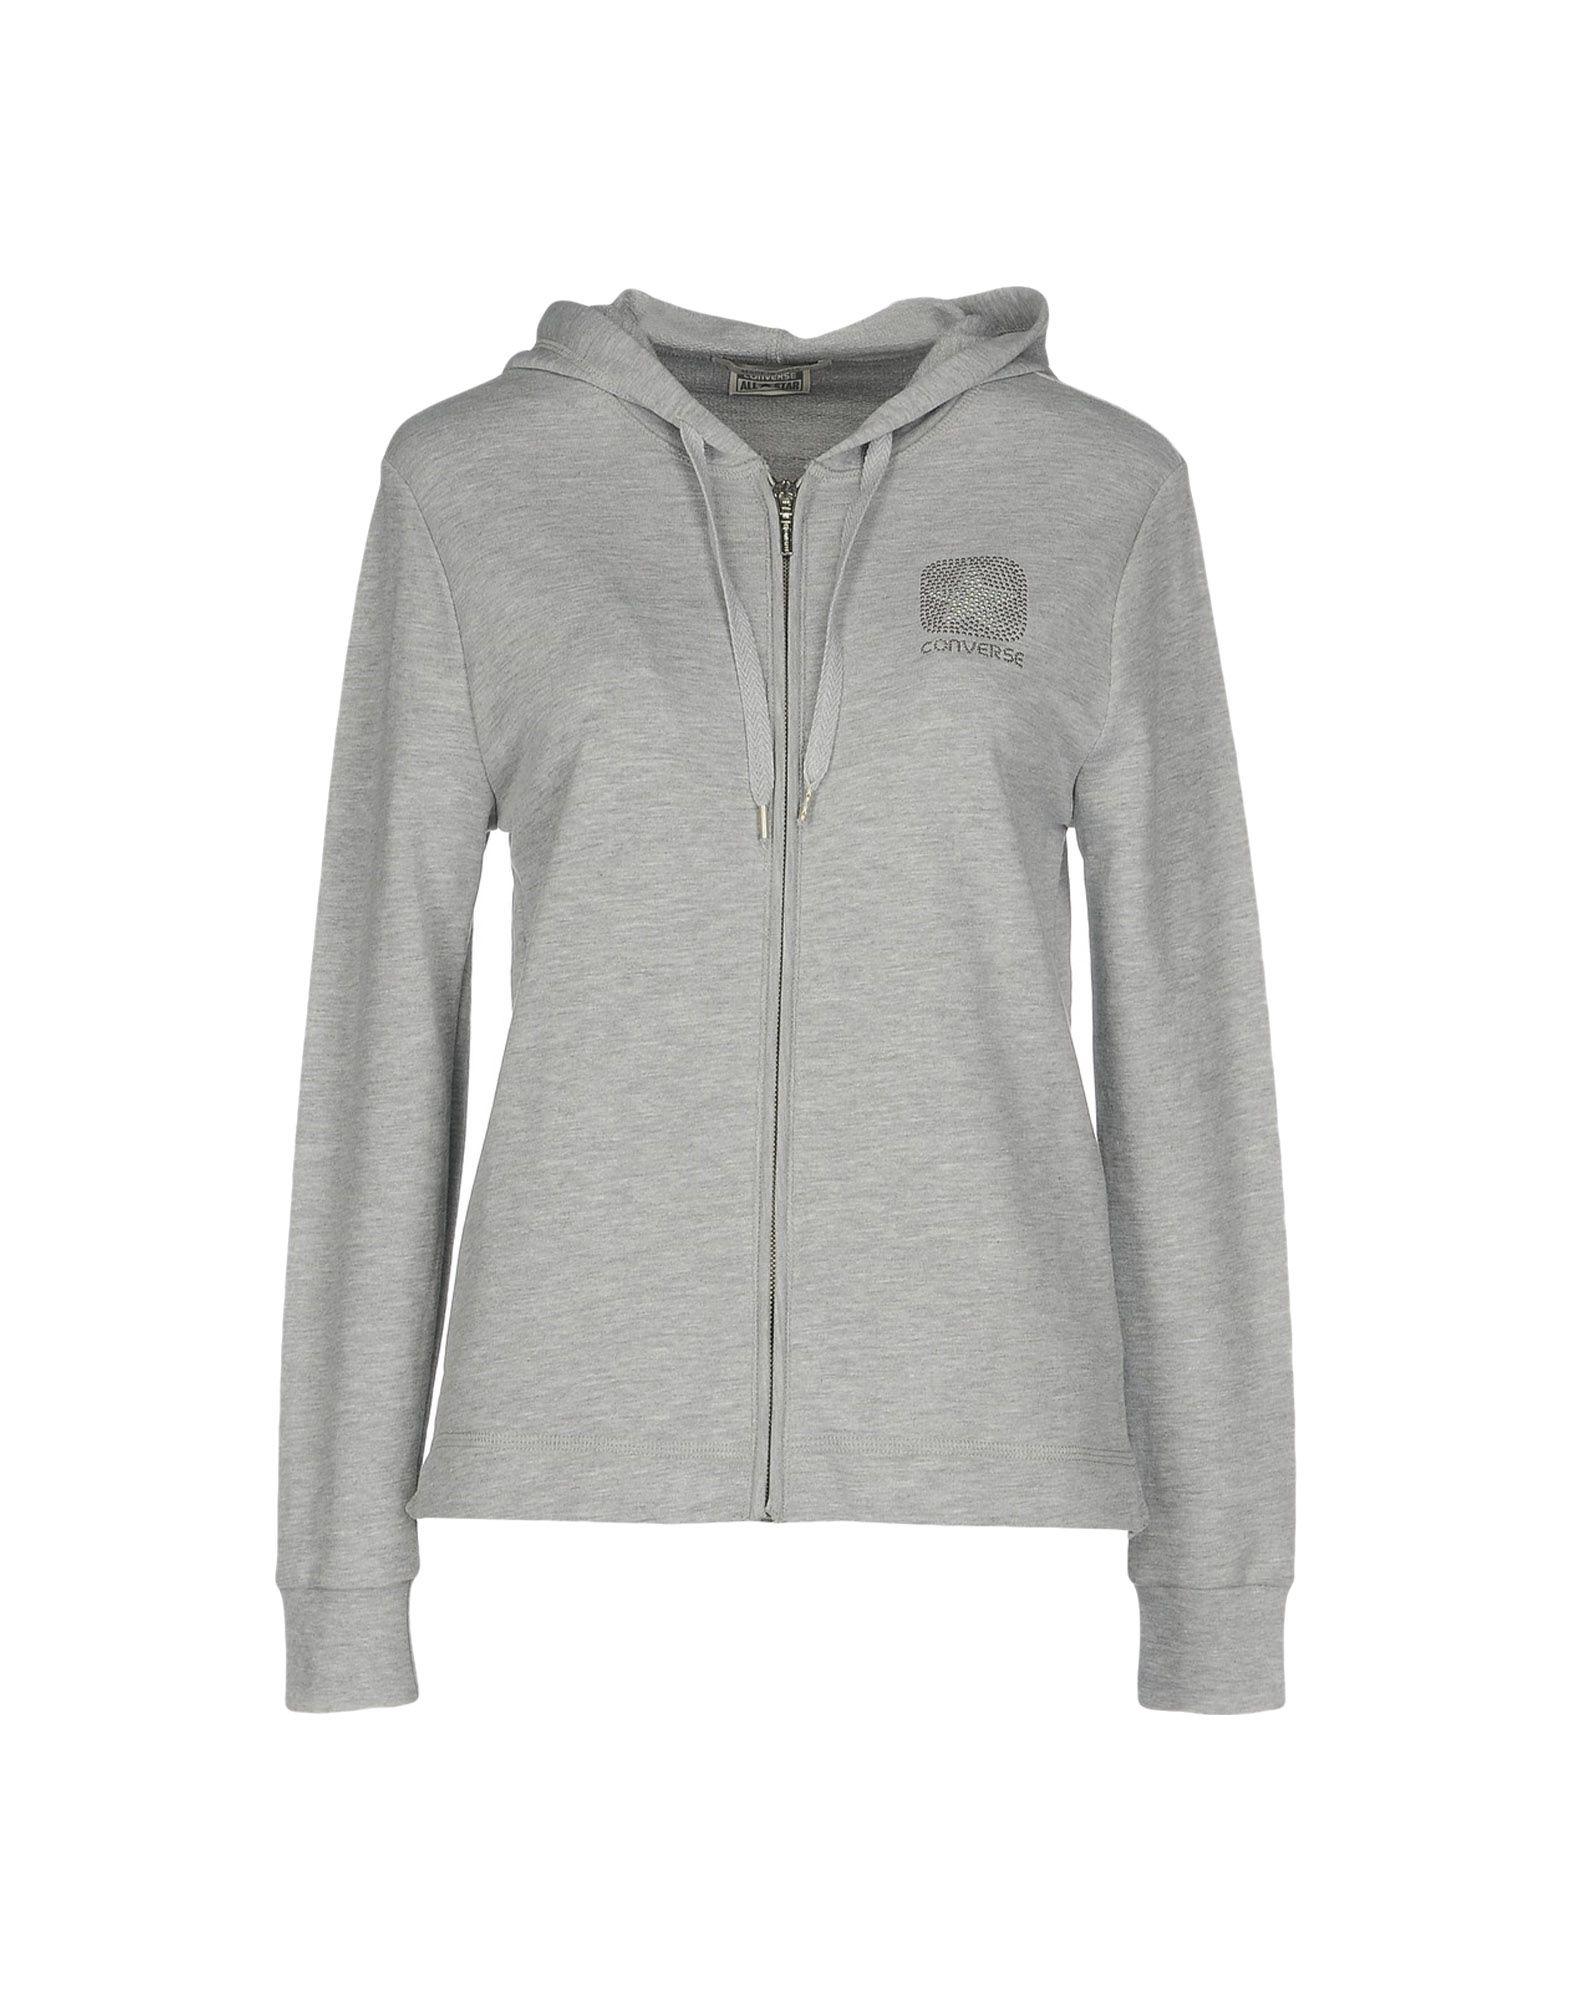 CONVERSE ALL STAR Damen Sweatshirt Farbe Grau Größe 4